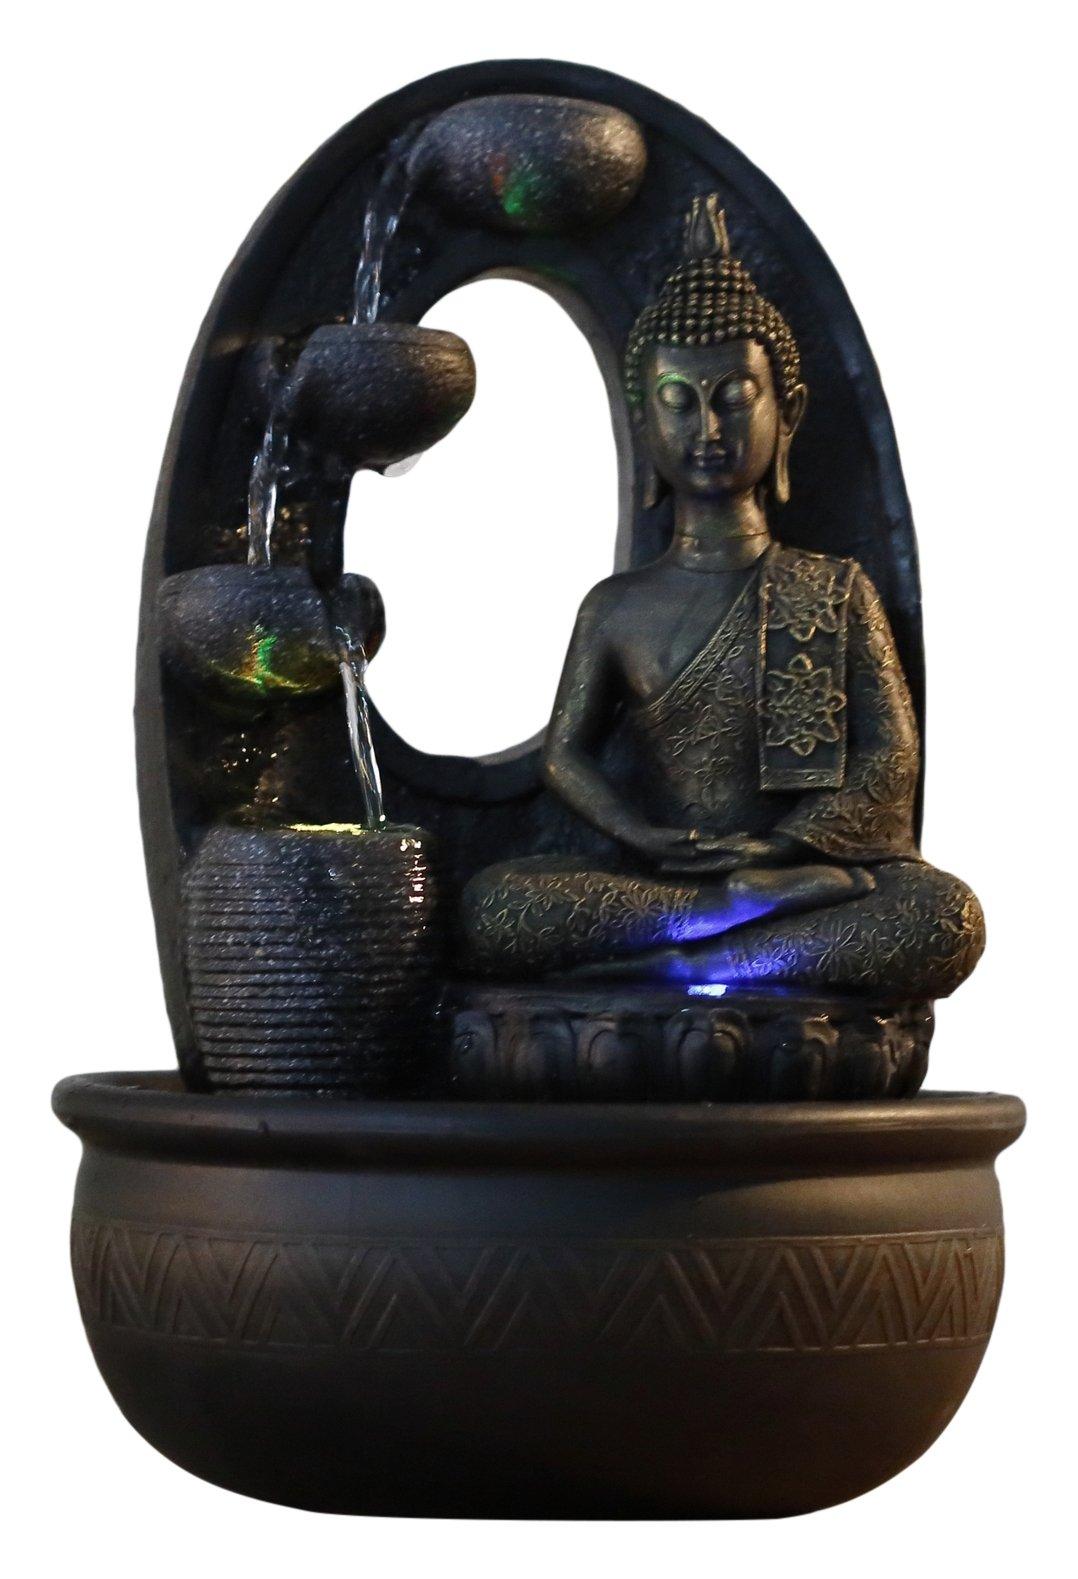 ZenLight - Harmonie Fuente de poliresina, 26 x 16 x 40 cm,